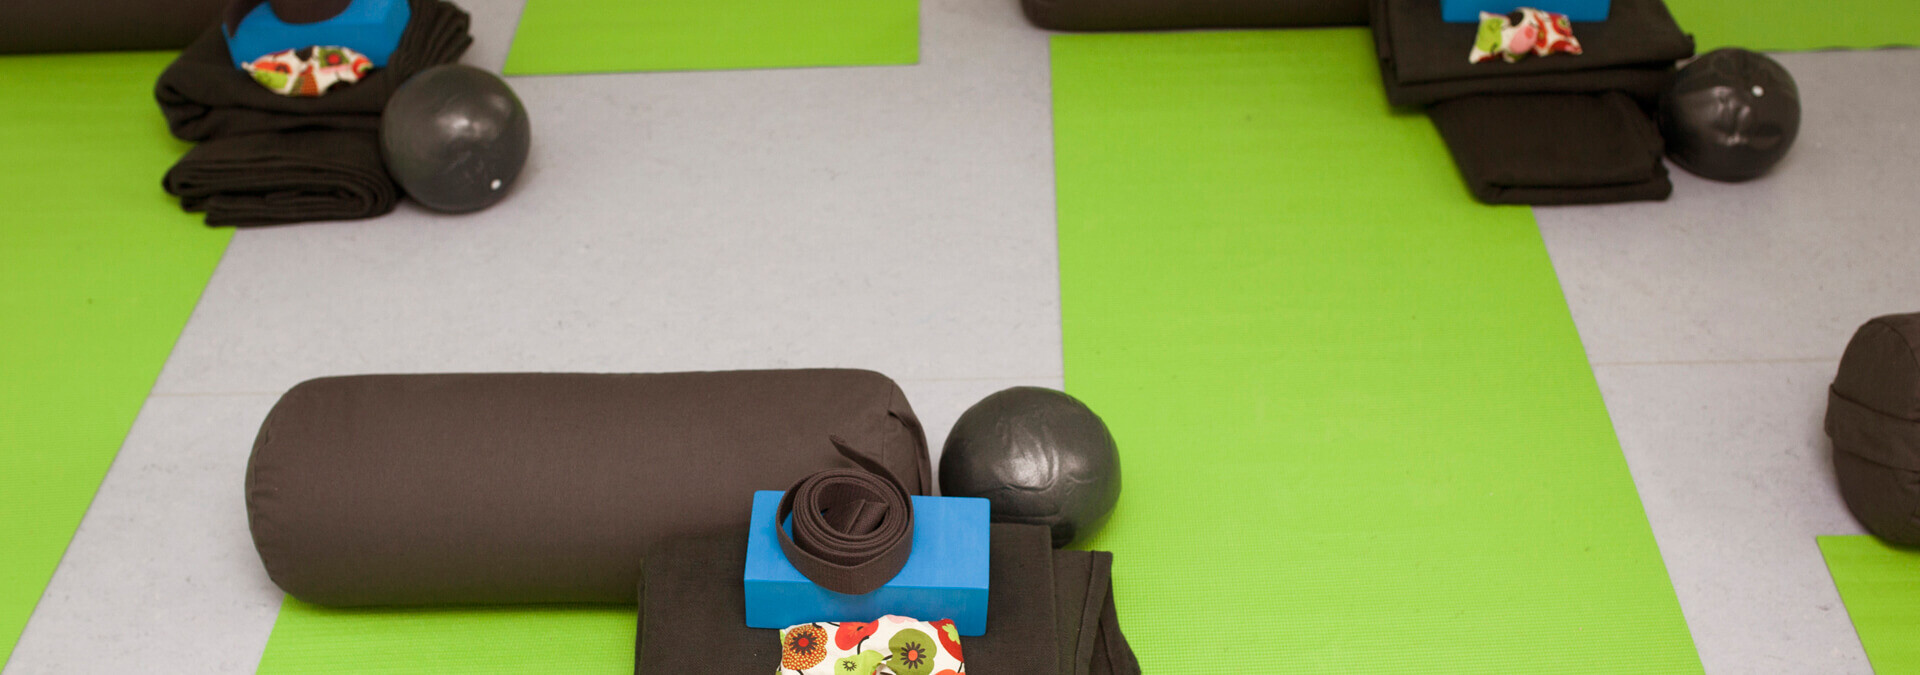 Yogamåtte og yogaudstyr lagt frem på gulvet på krisecenter